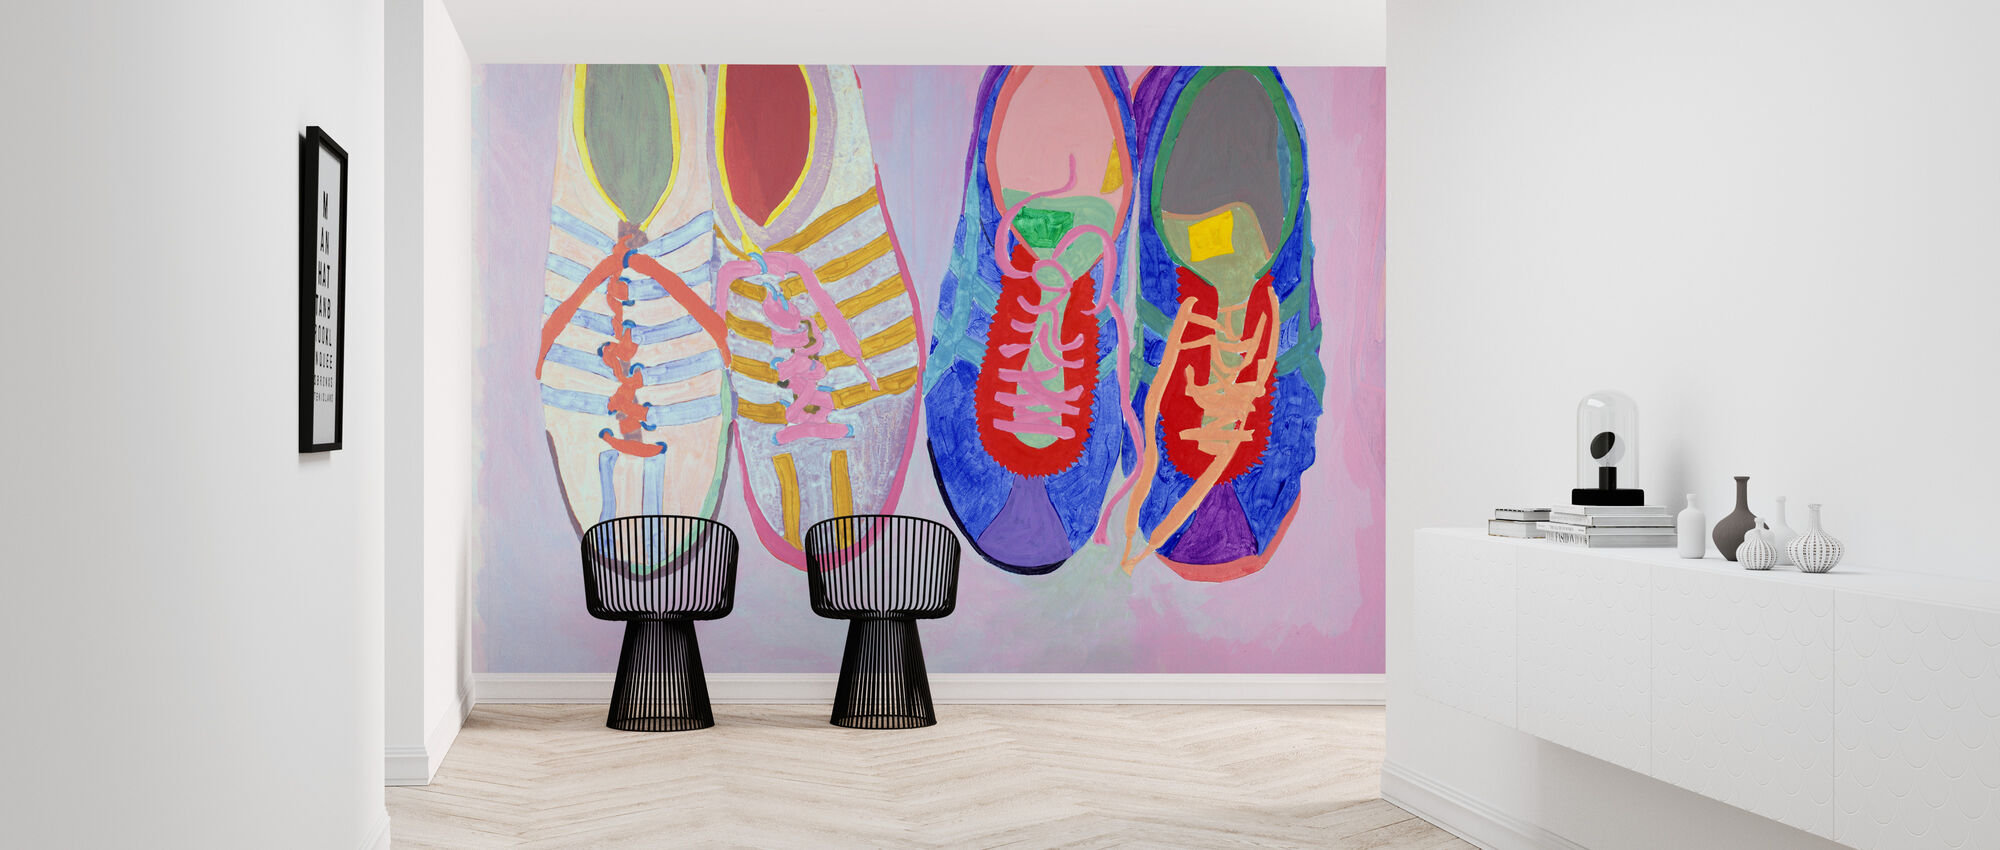 Shoe Series Ten - Marilee Whitehouse-Holm - Wallpaper - Hallway